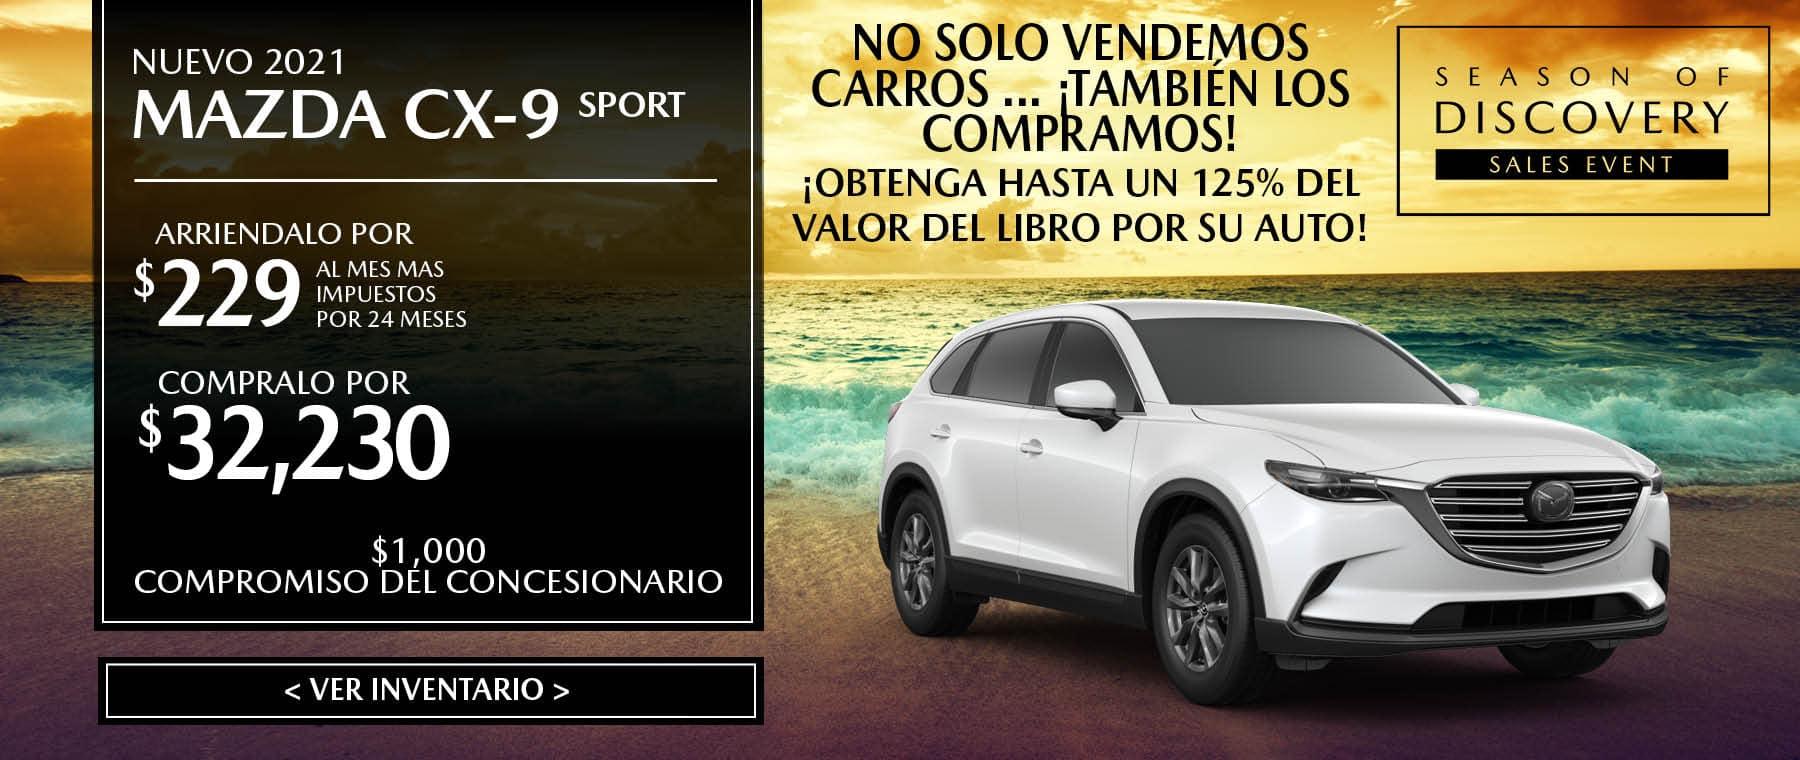 6.3.2021_CX9Sport_Spanish